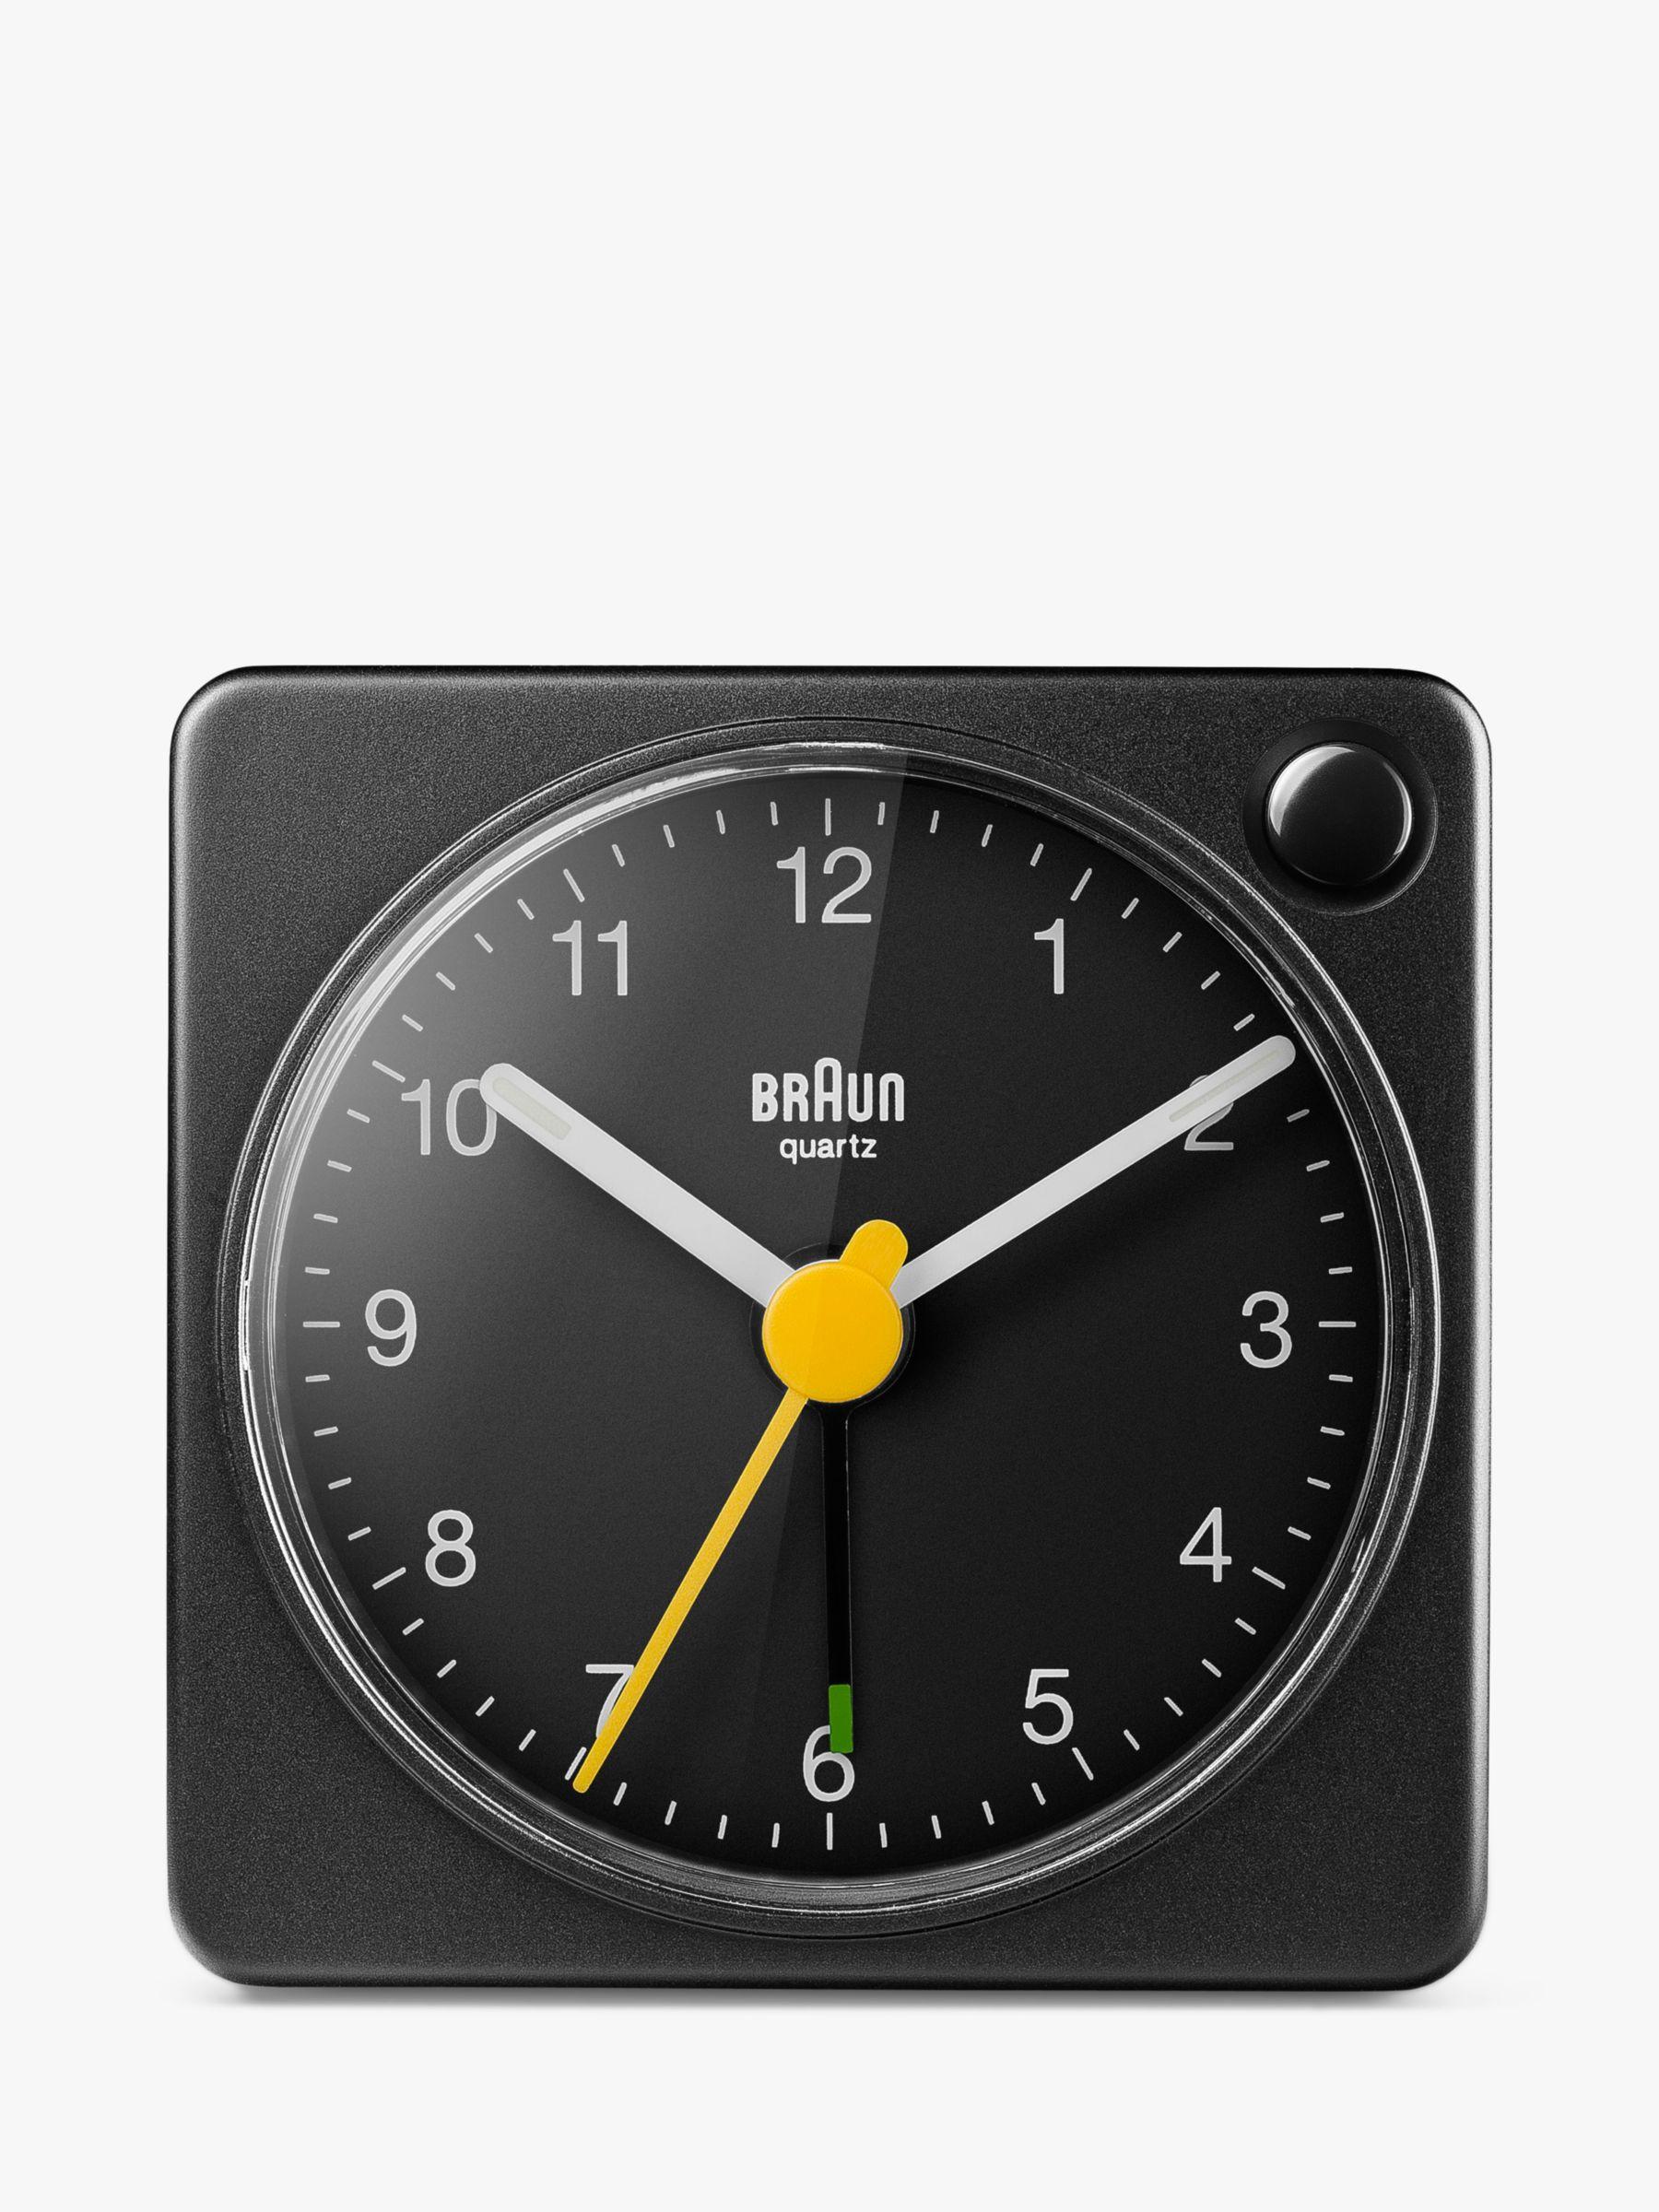 Braun Braun Analogue Compact Travel Alarm Clock, Black